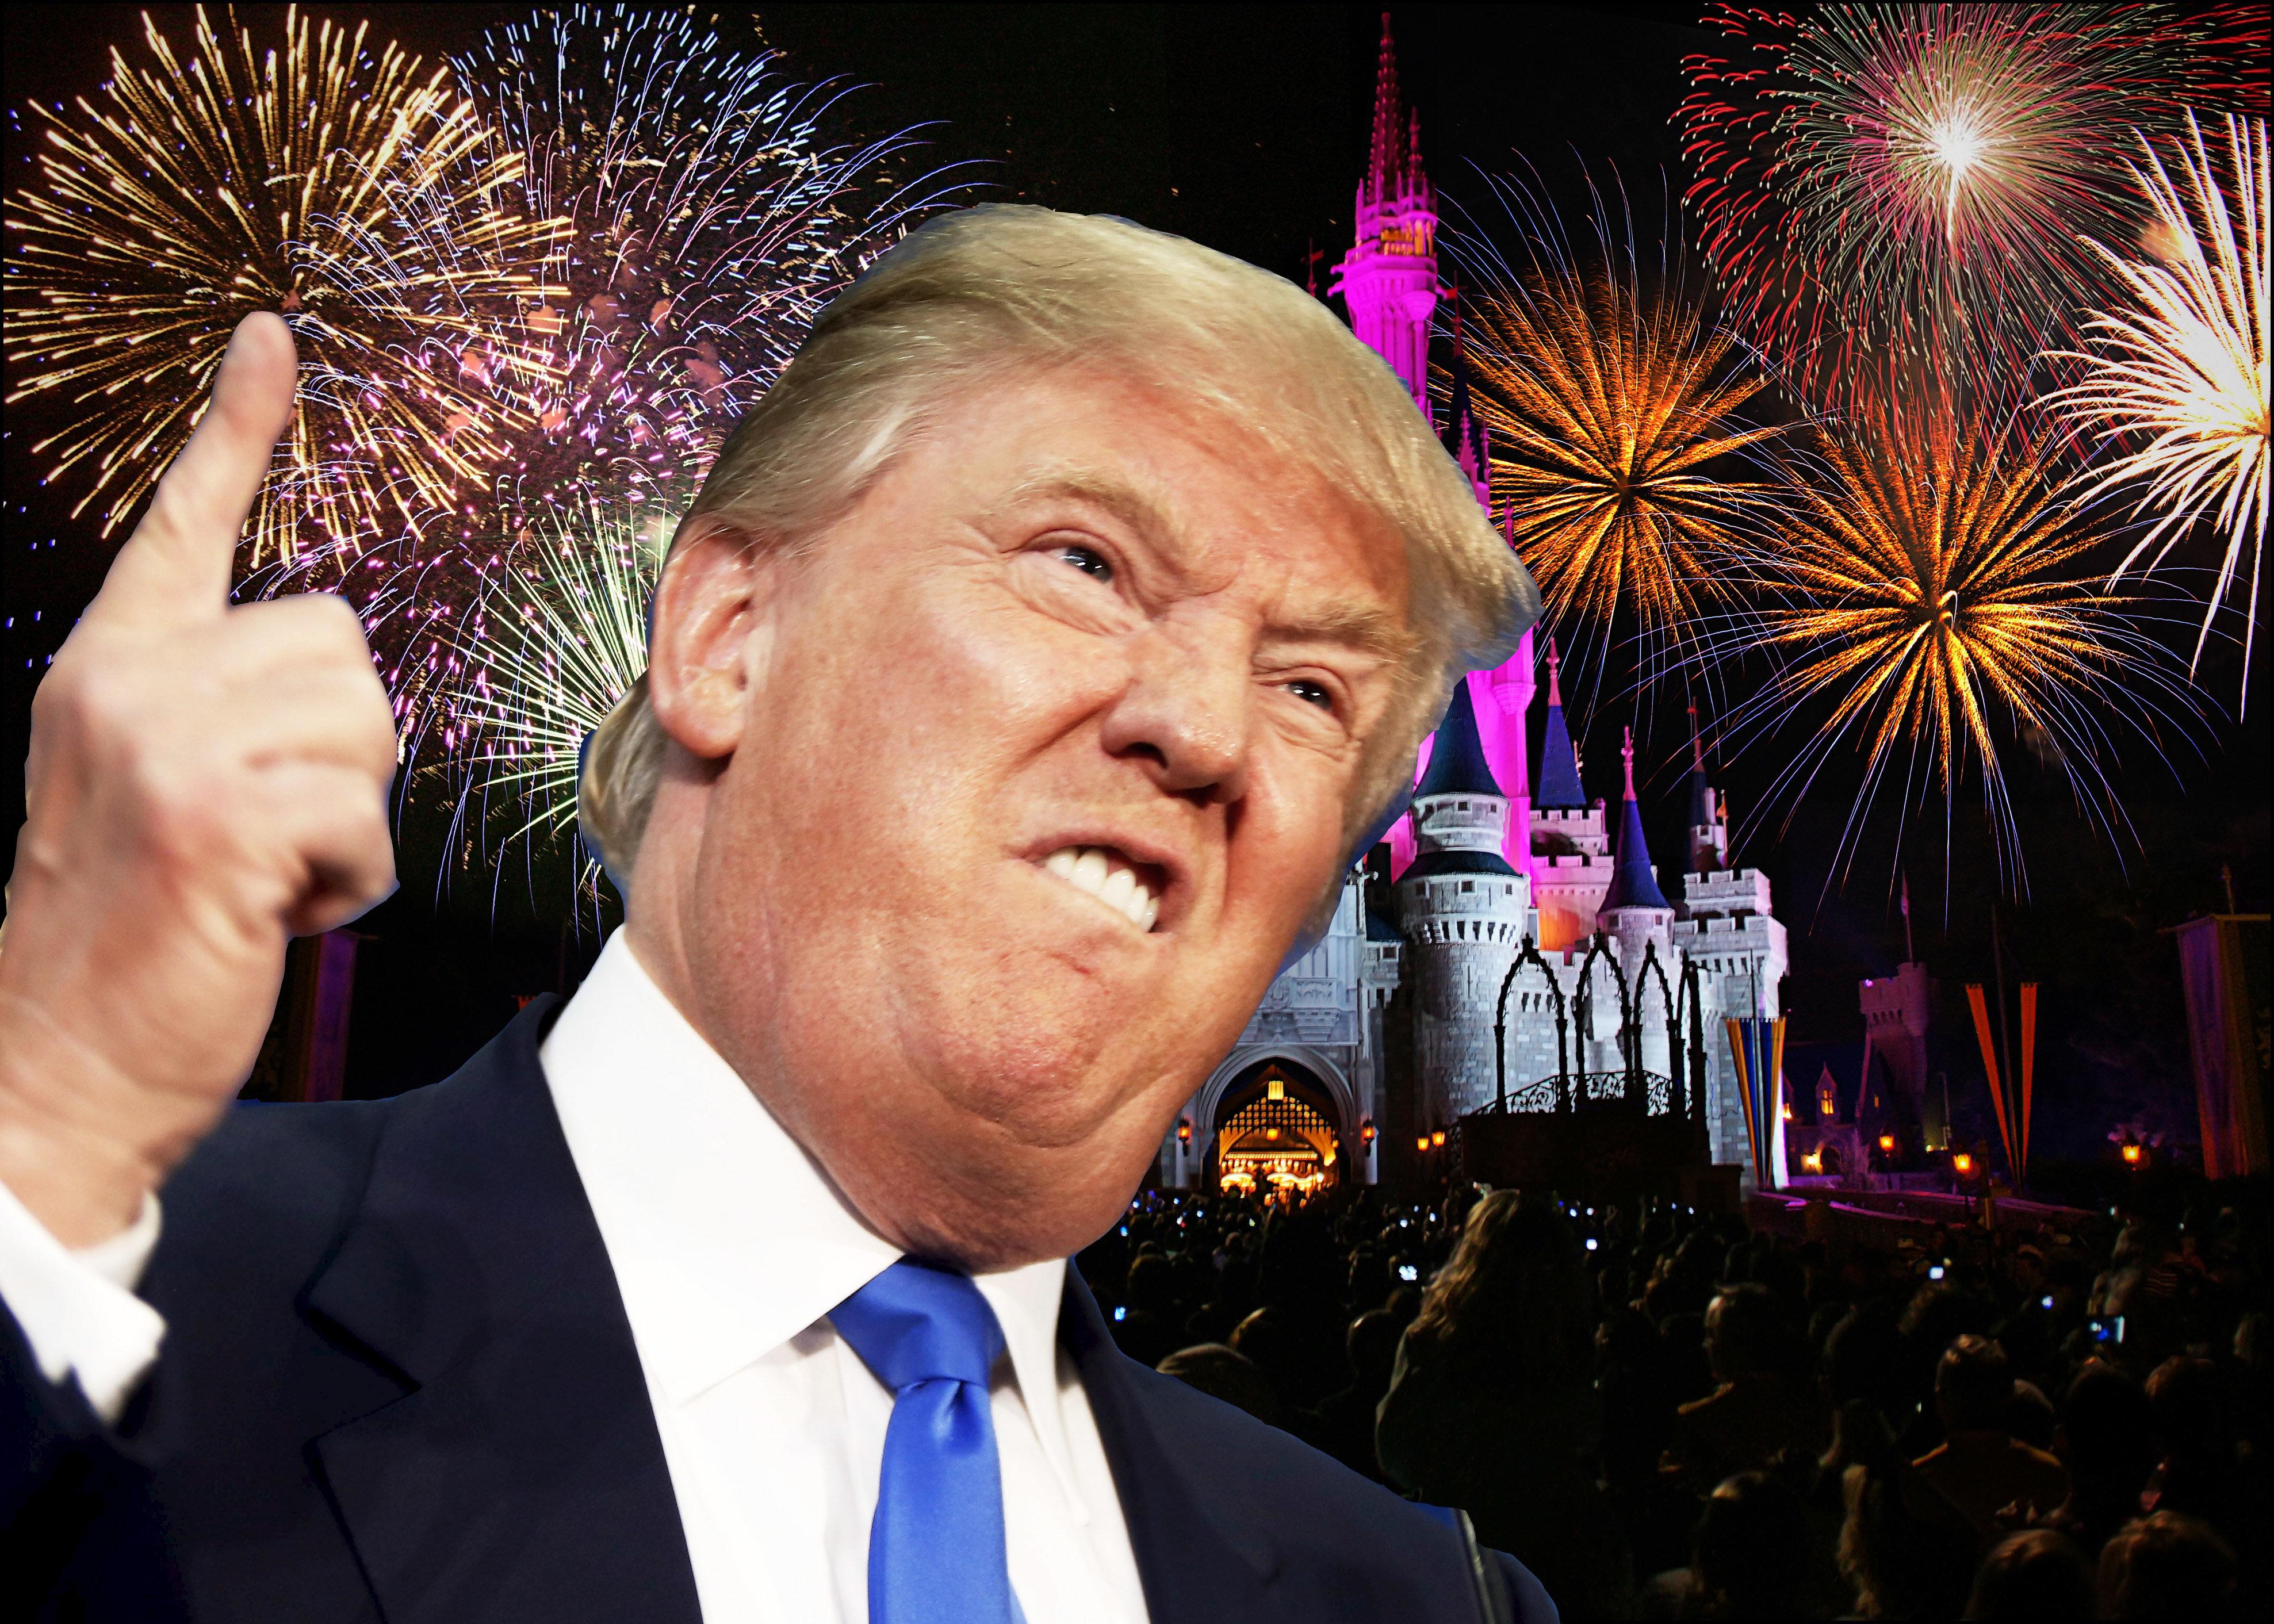 [UNVERIFIED CONTENT] walt disney world - magic kingdom castle fireworks